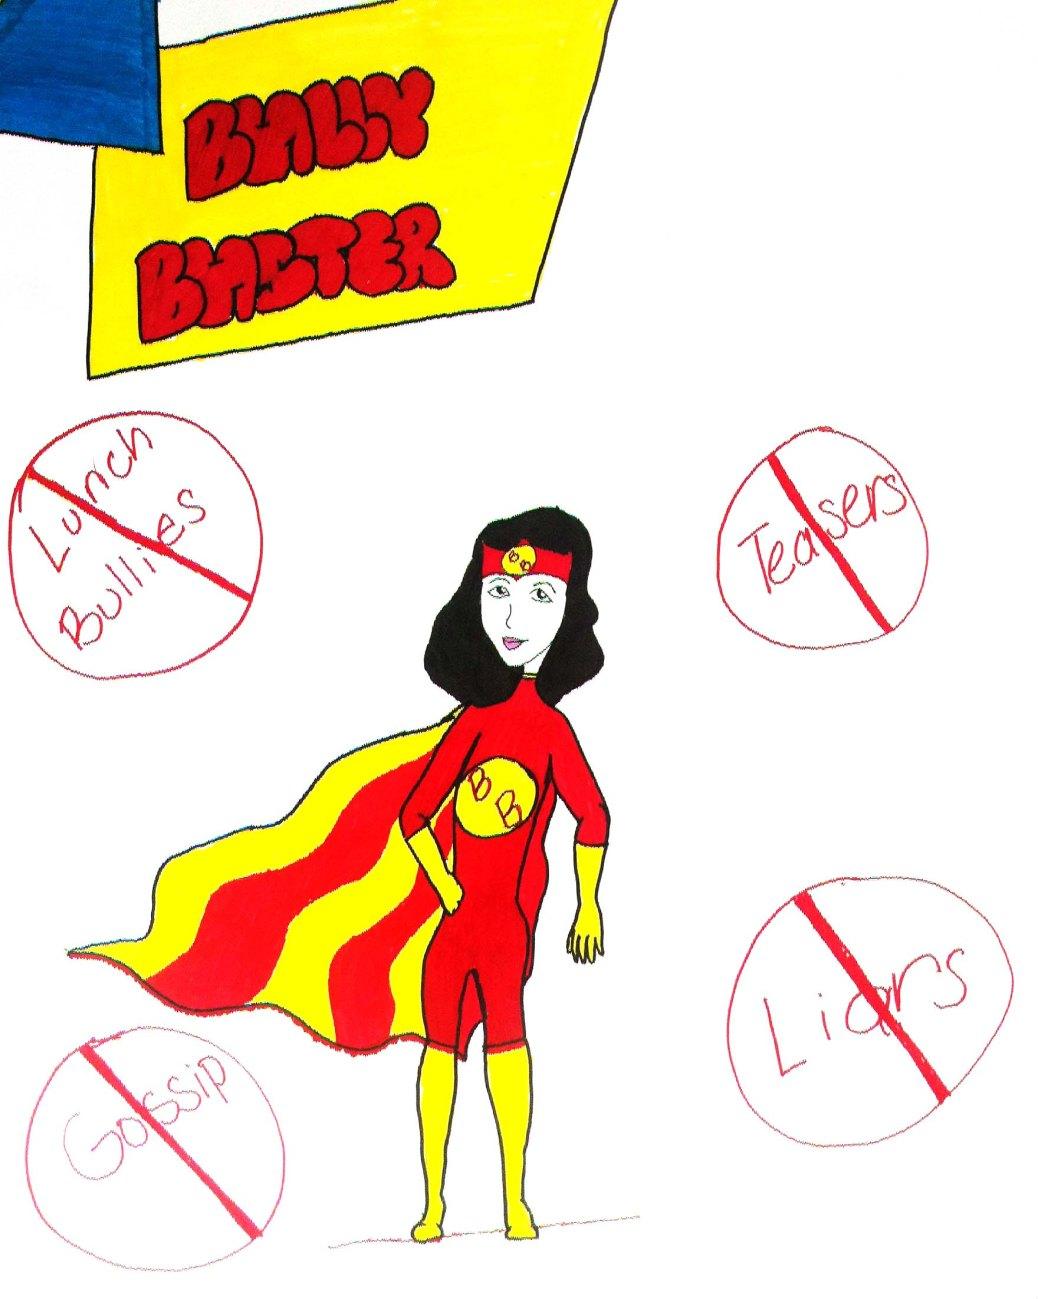 Bully Buster Superhero Artwork by Daisy Maldonado